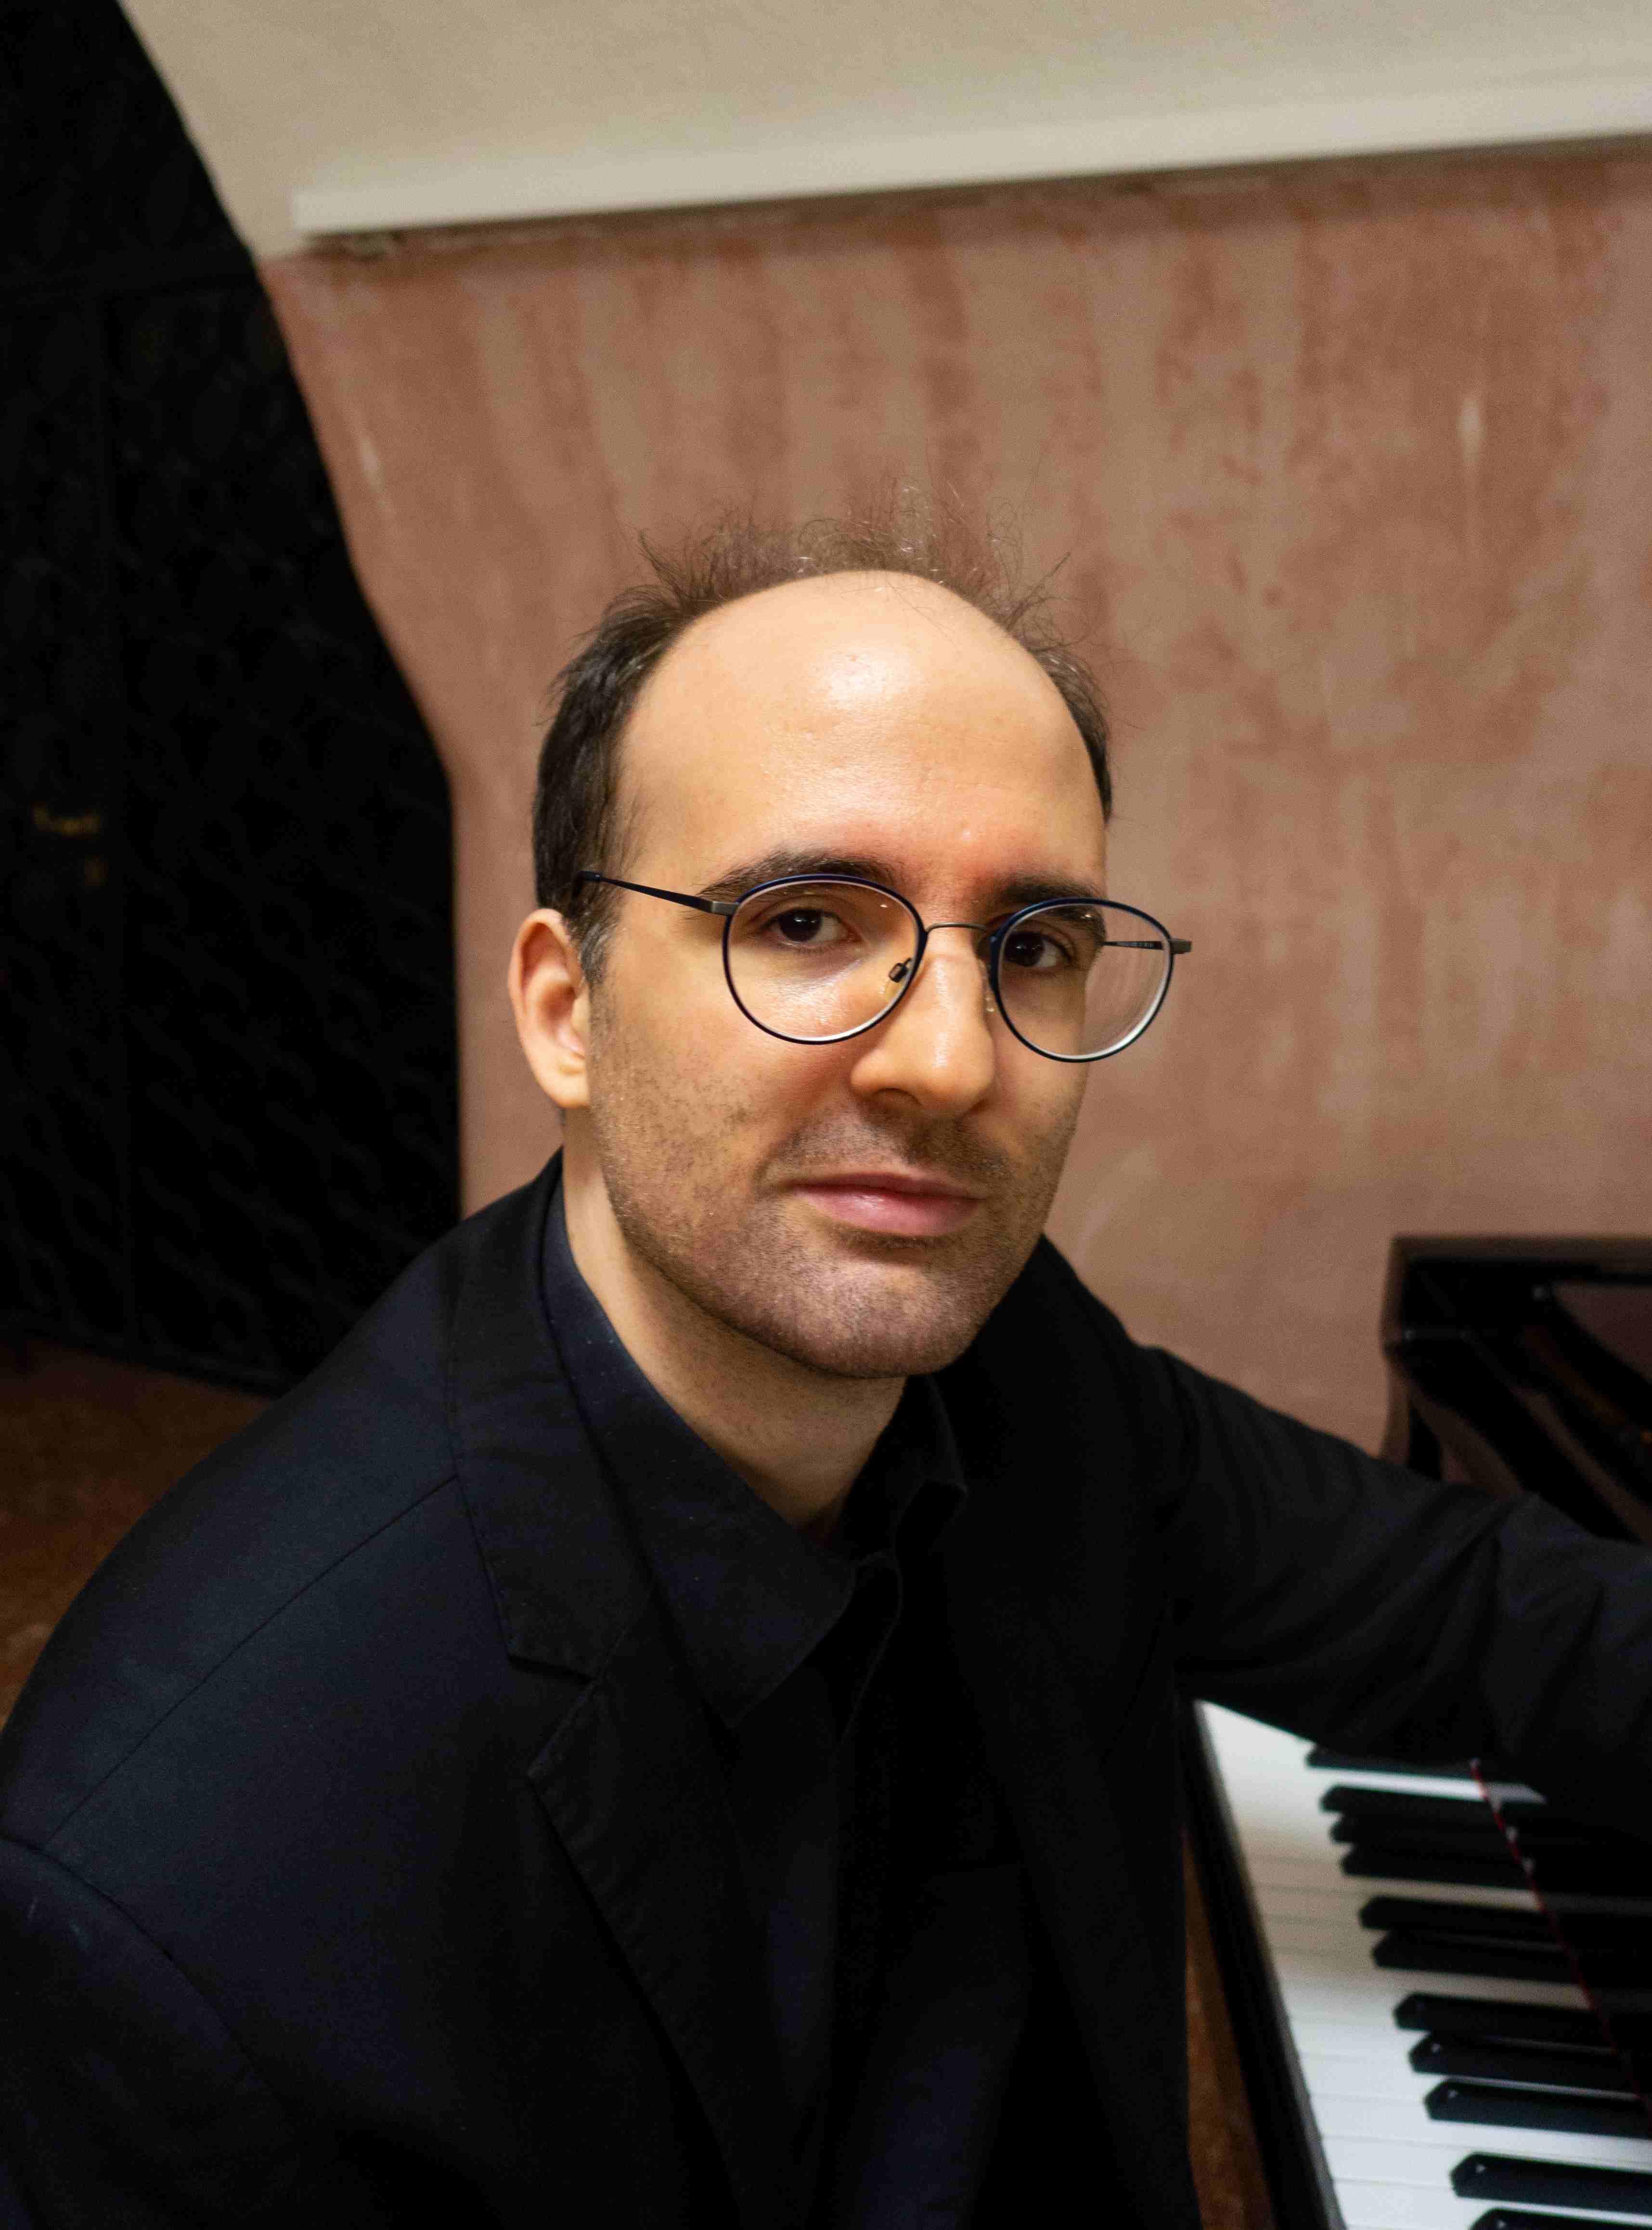 Maximilian Schamschula,  Klavier und musikalische Leitung